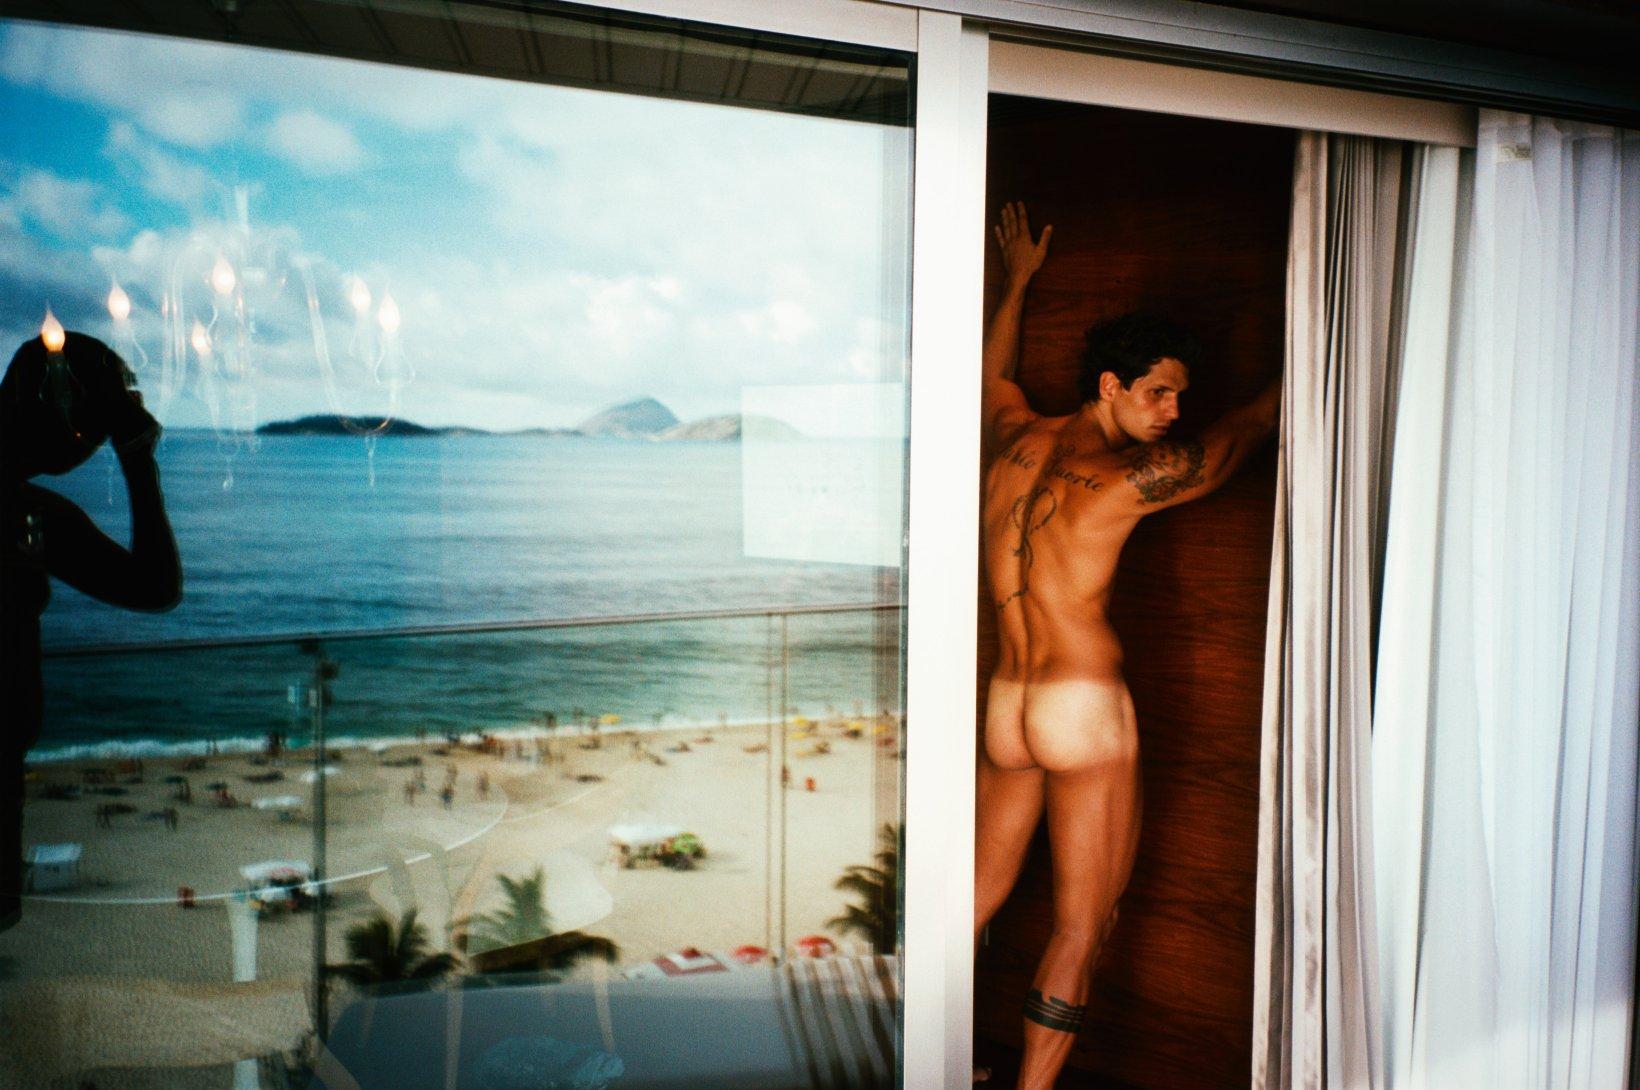 Fotó: Mario Testino: Fernando Fernandes, Rio de Janeiro, 2008 © Mario Testino